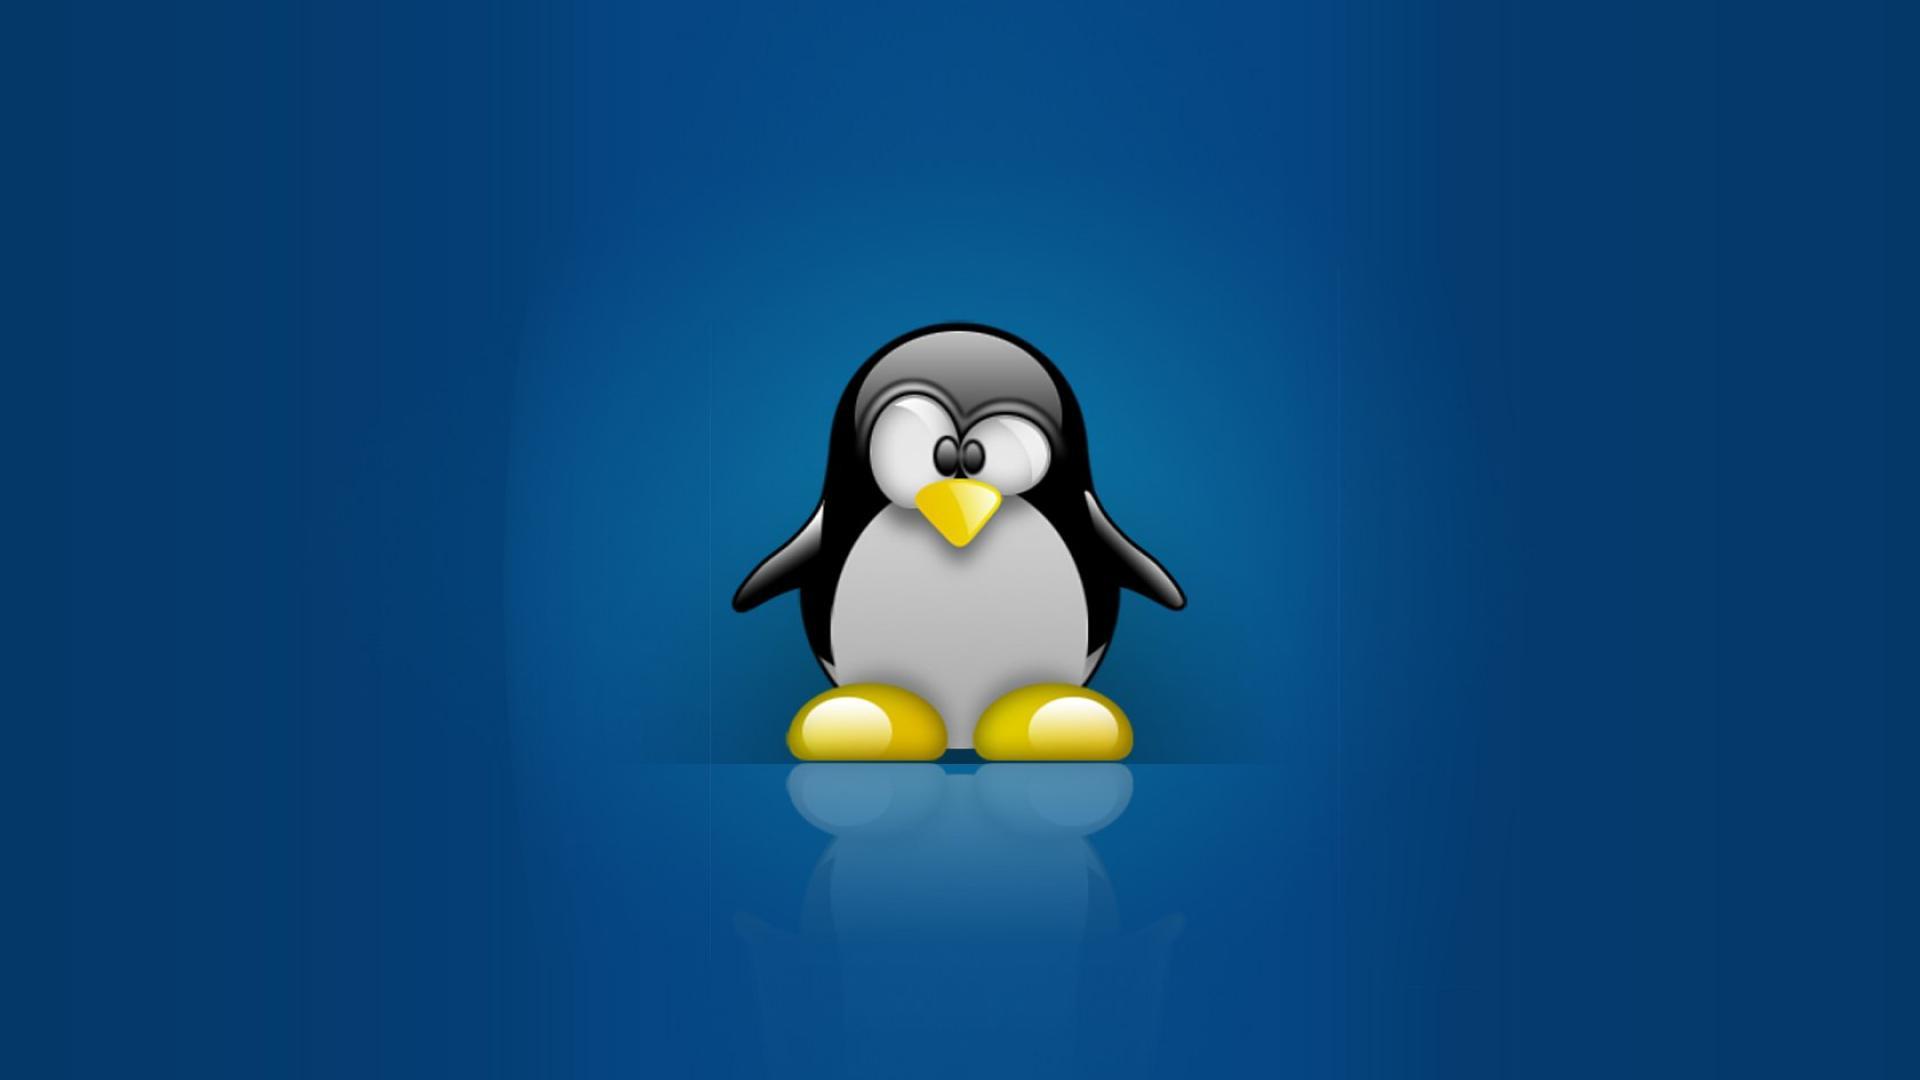 3d Hd Wallpapers For Laptop 1366x768 Linux Learner Bundle